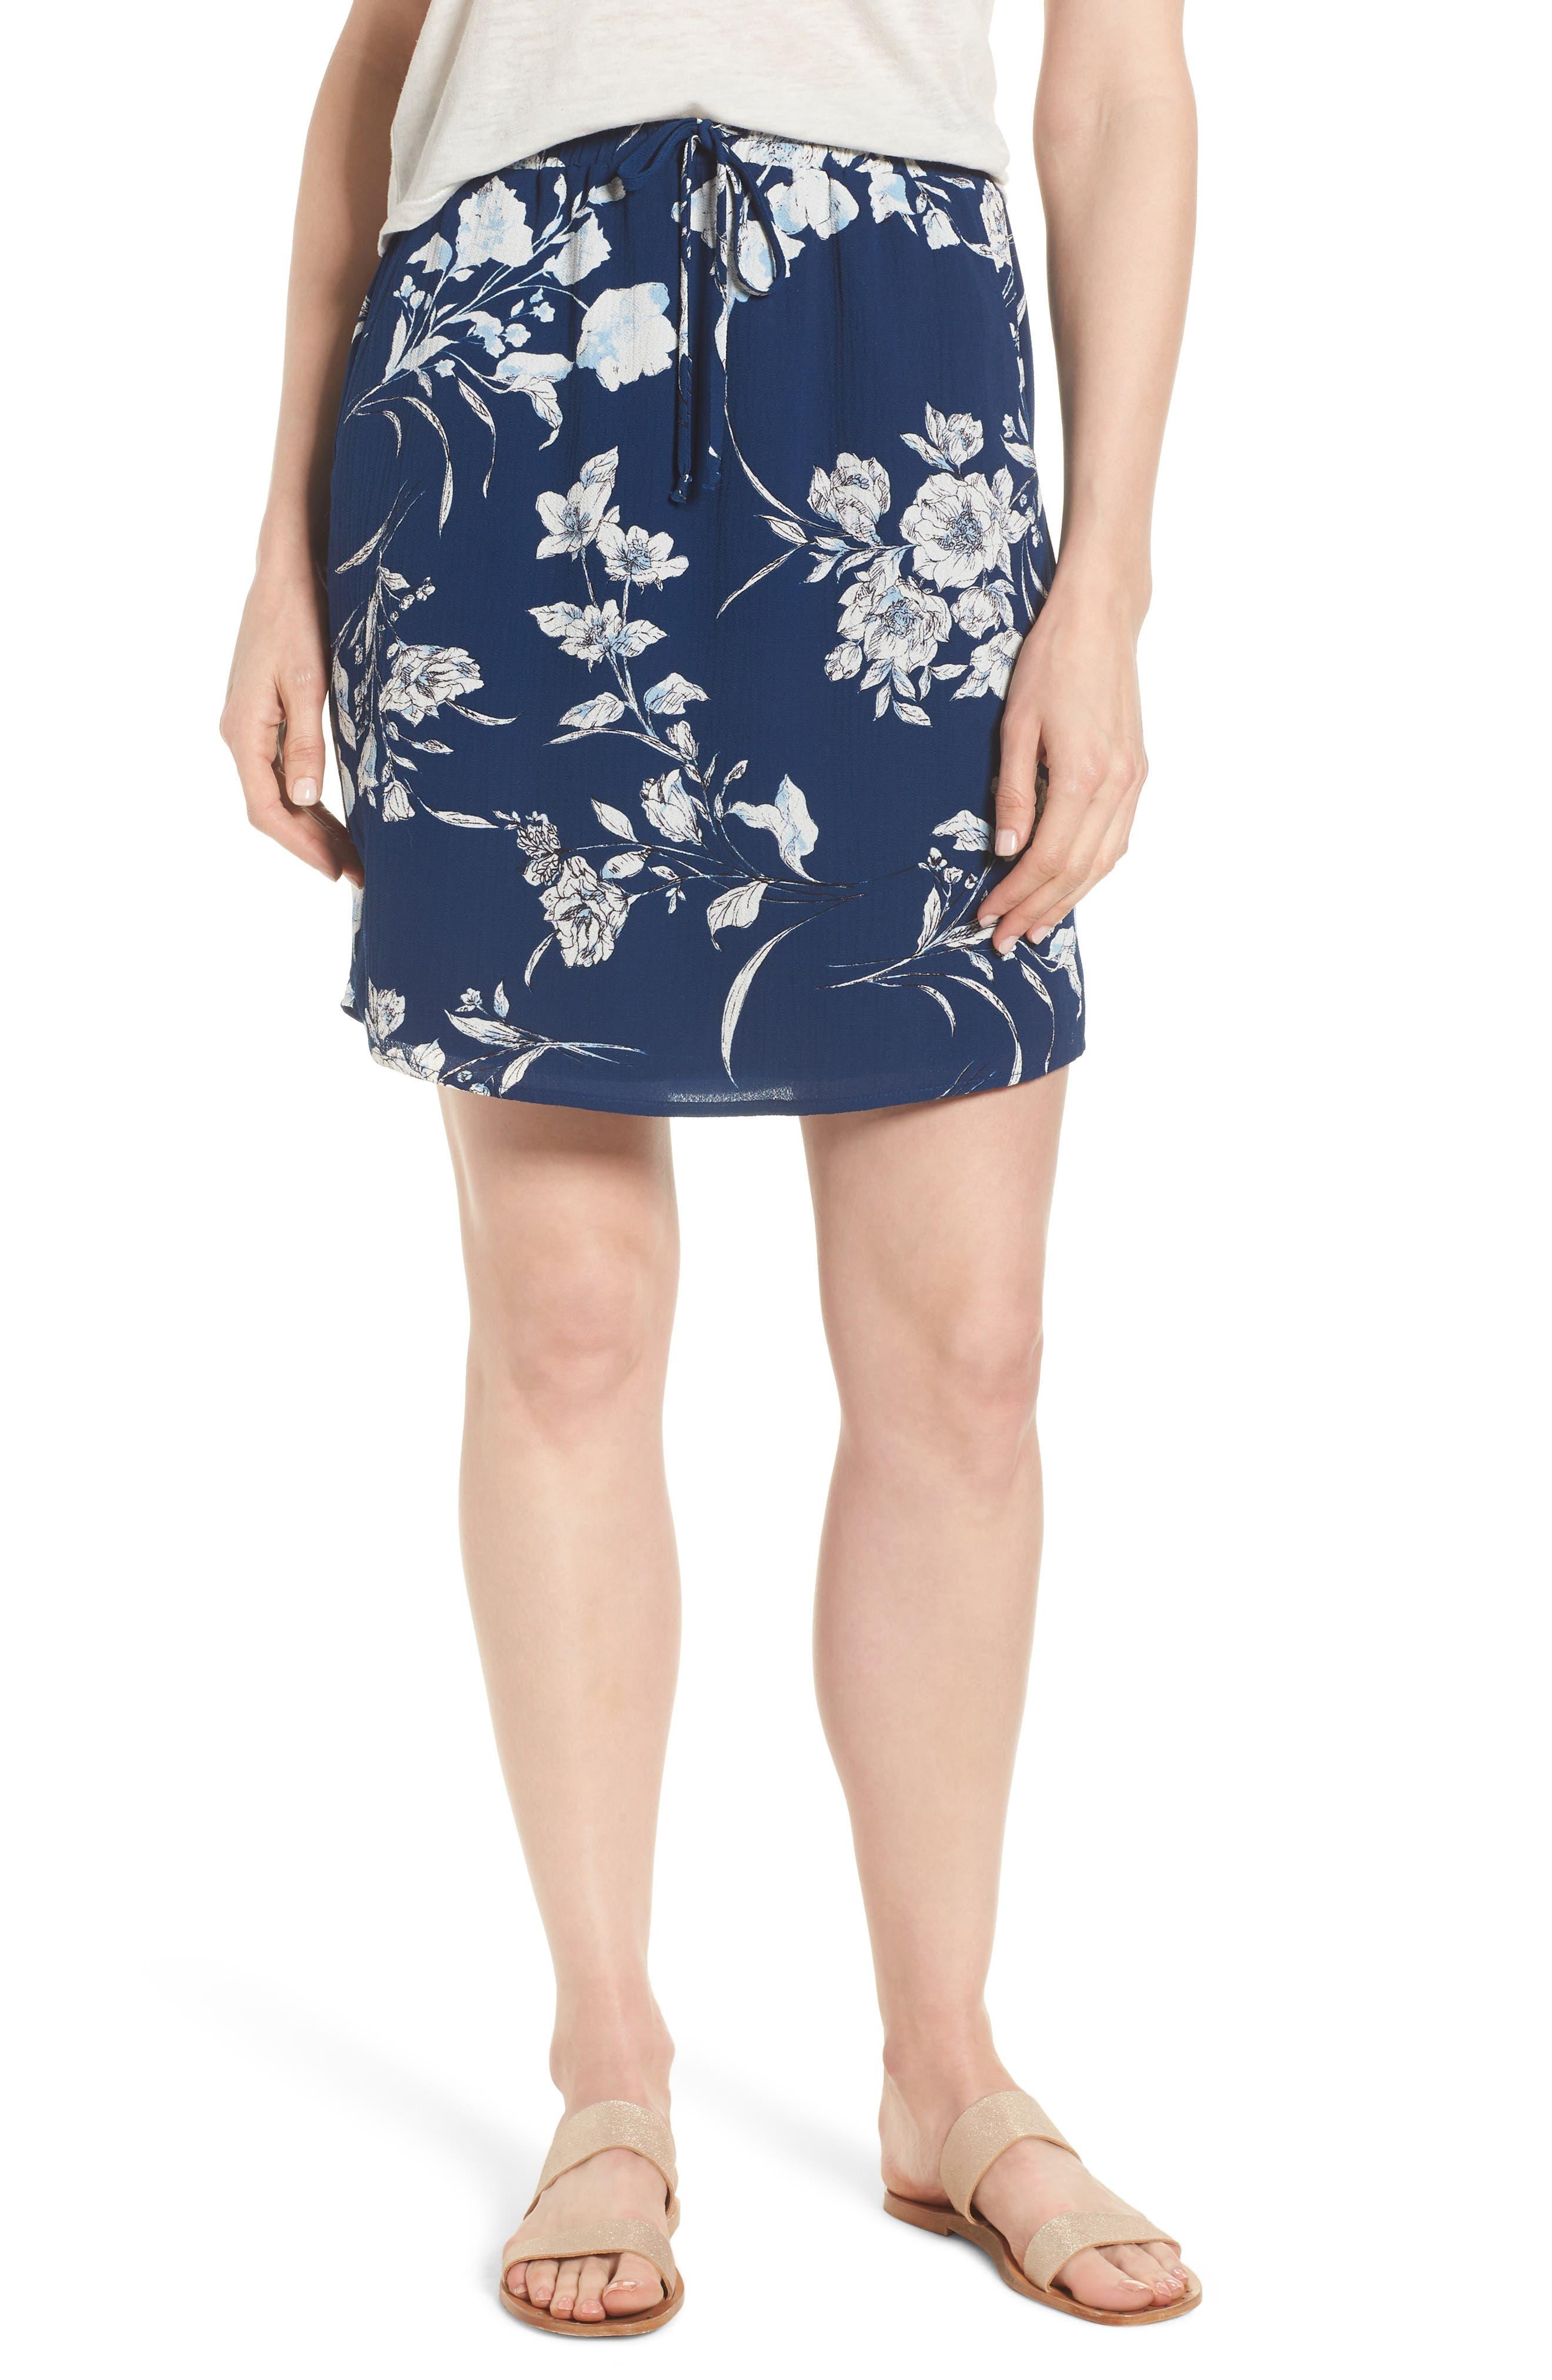 x Hi Sugarplum! Monterey Easy Skirt,                             Main thumbnail 1, color,                             Cool Breeze Floral